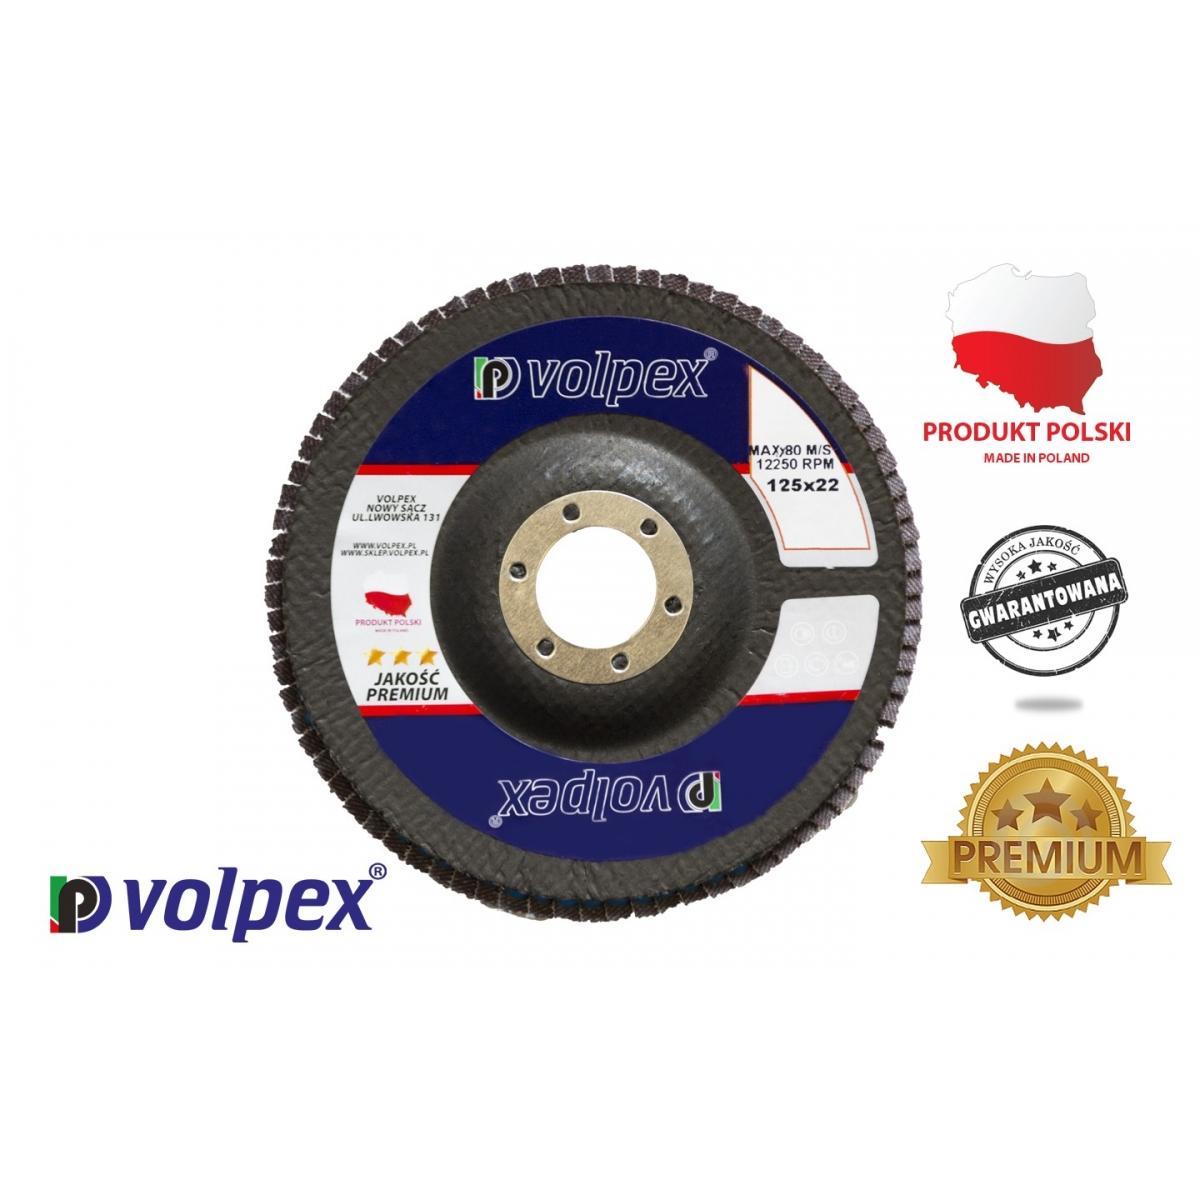 Tarcza płytkowa 125 mm, inox premium - VOLPEX Tarcza płytkowa 125 mm, inox premium - VOLPEX